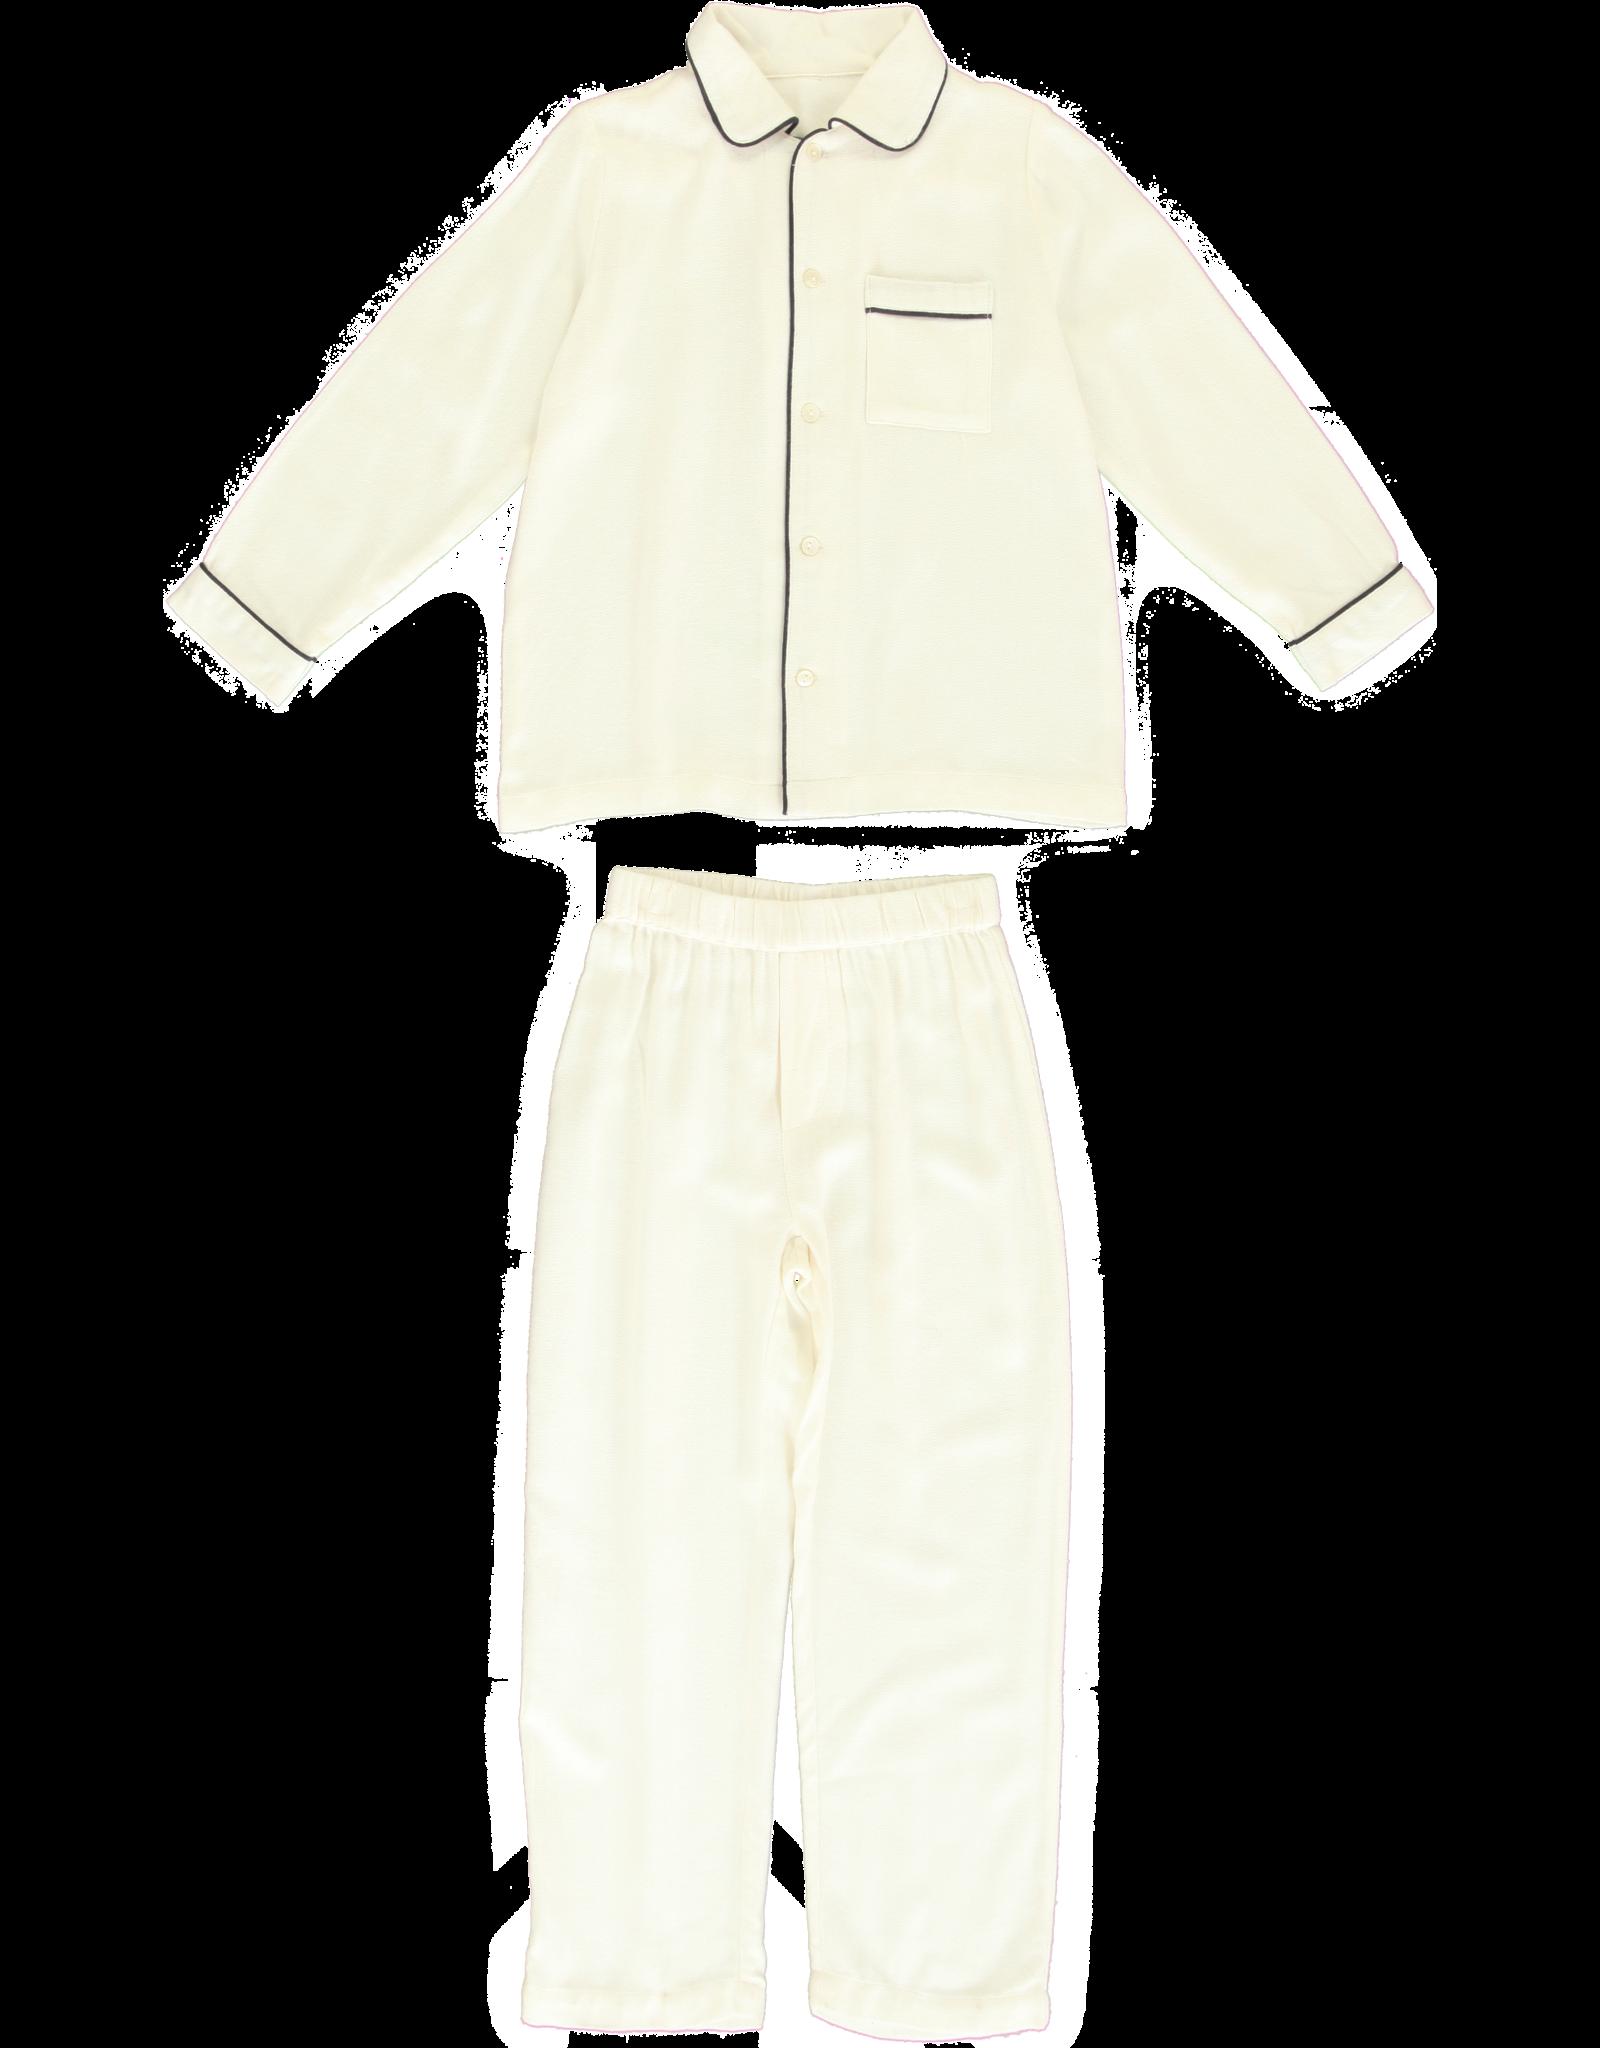 Dorélit Mercure + Venus   Pajama Set Woven   Offwhite